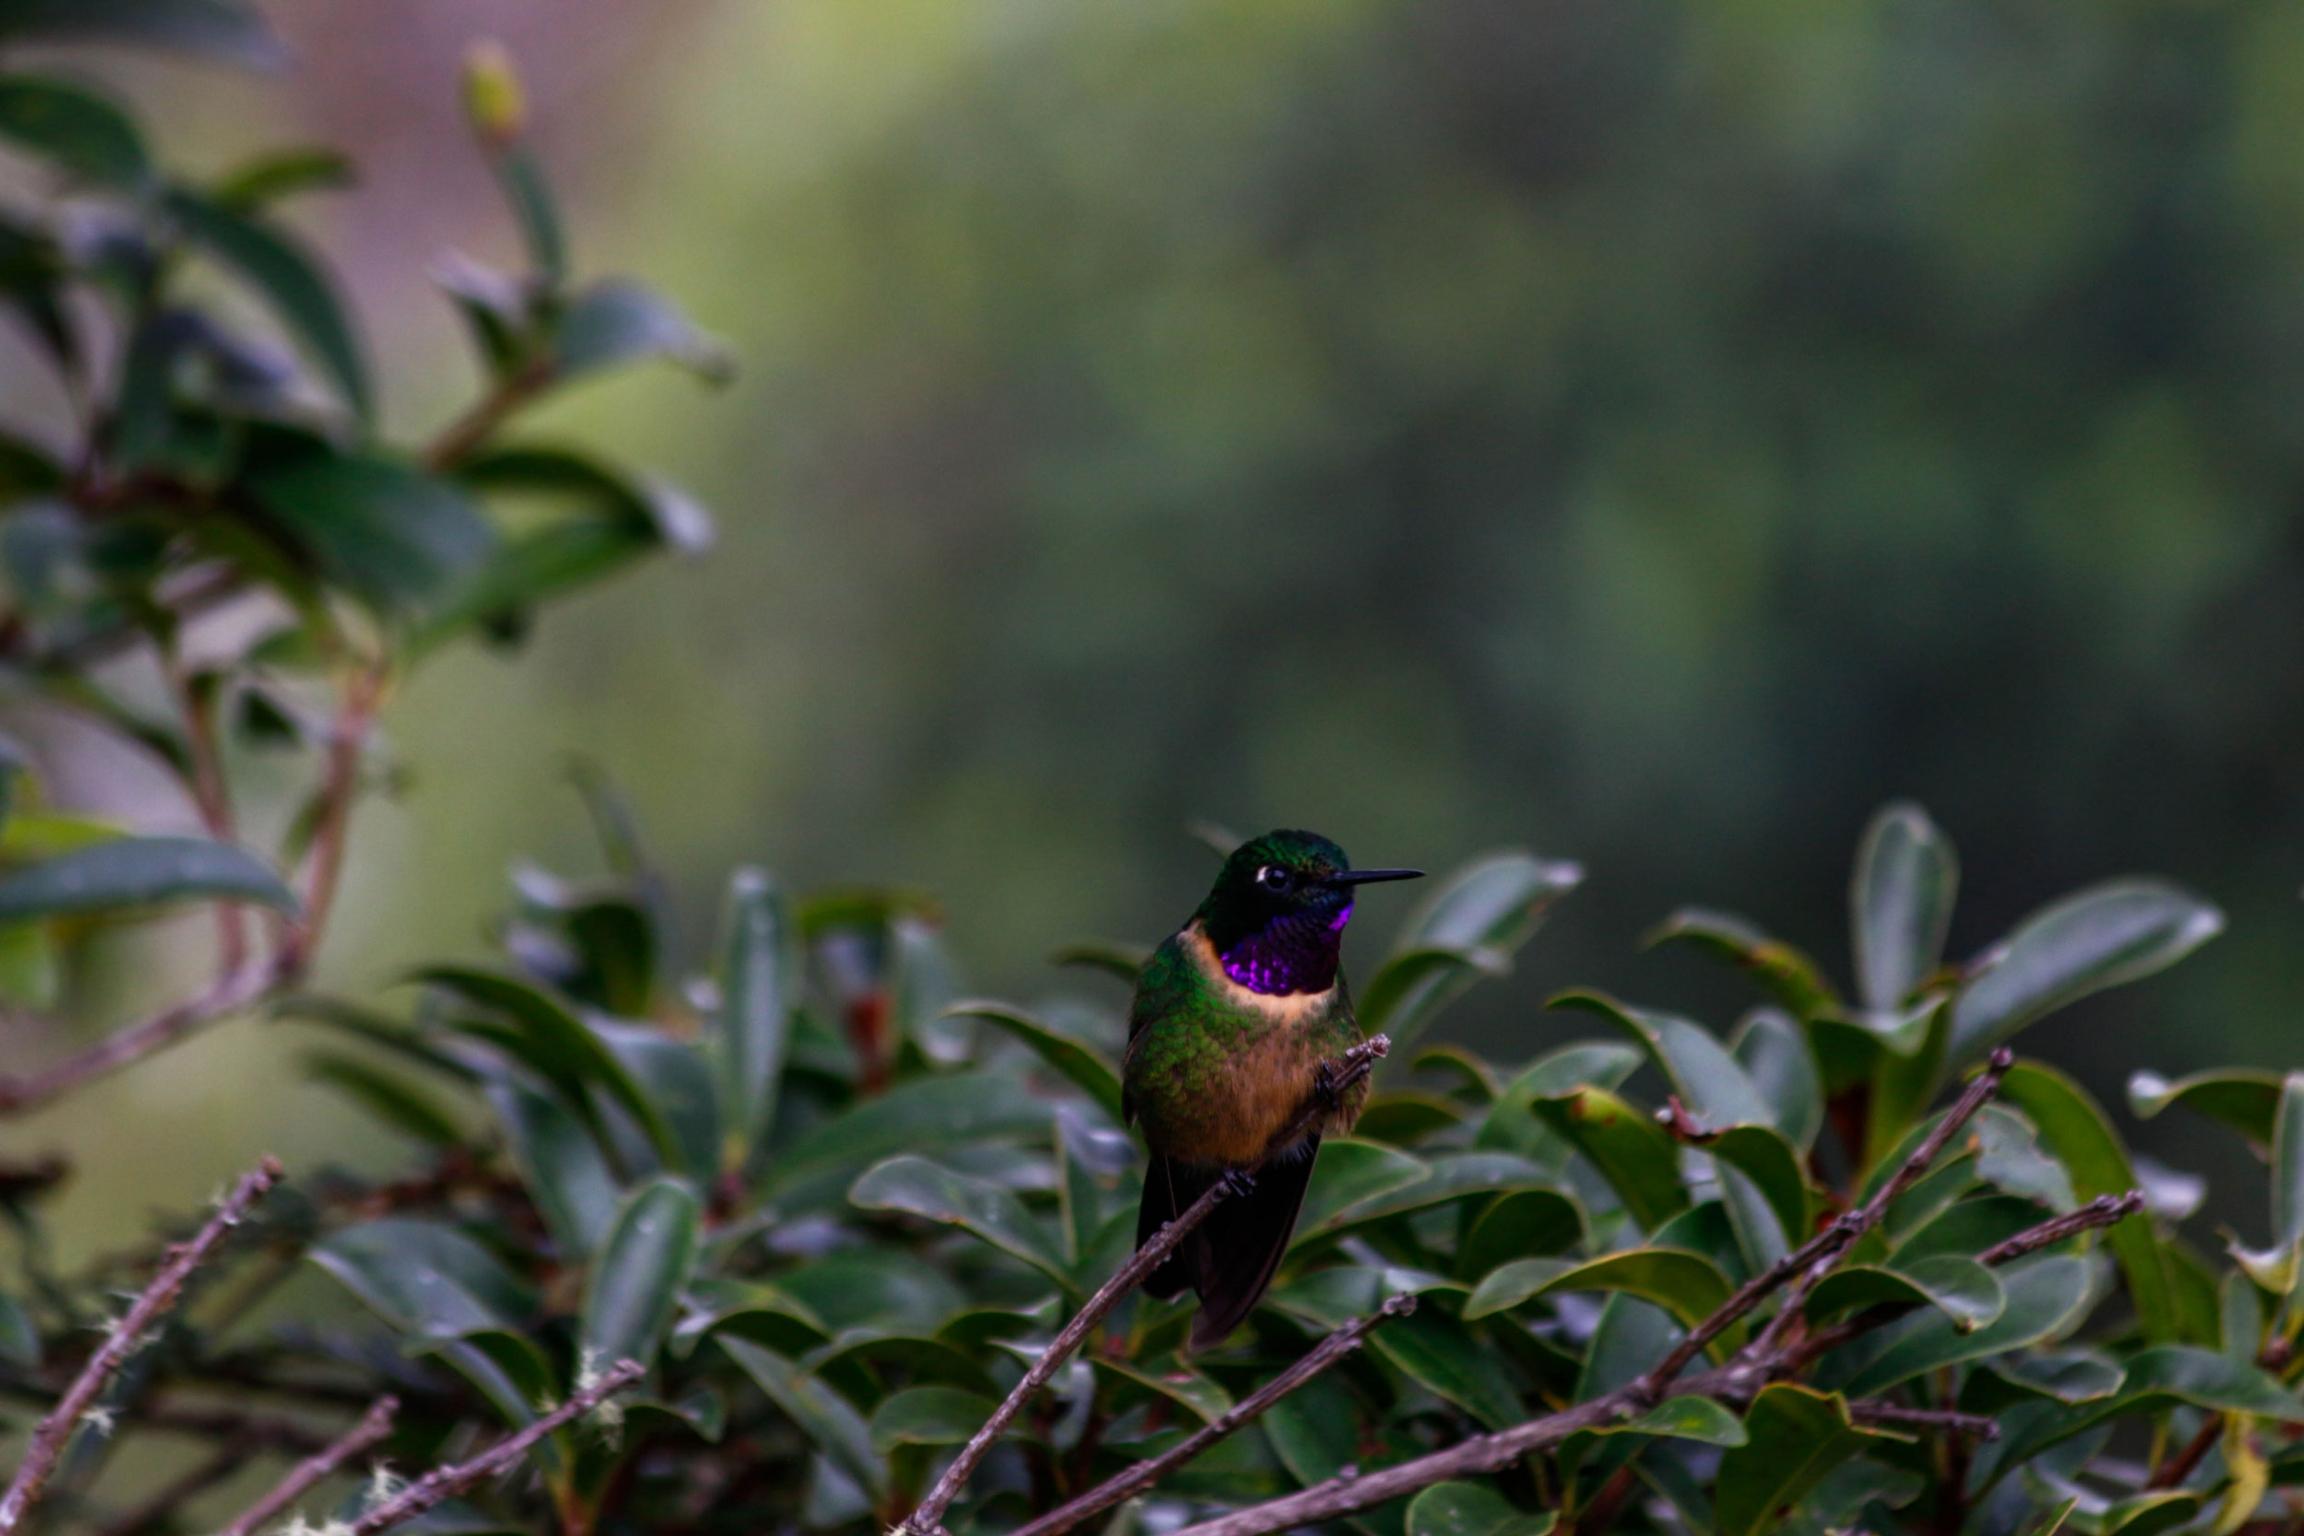 An amethyst-throated sunangel hummingbird is shown sitting on a branch.